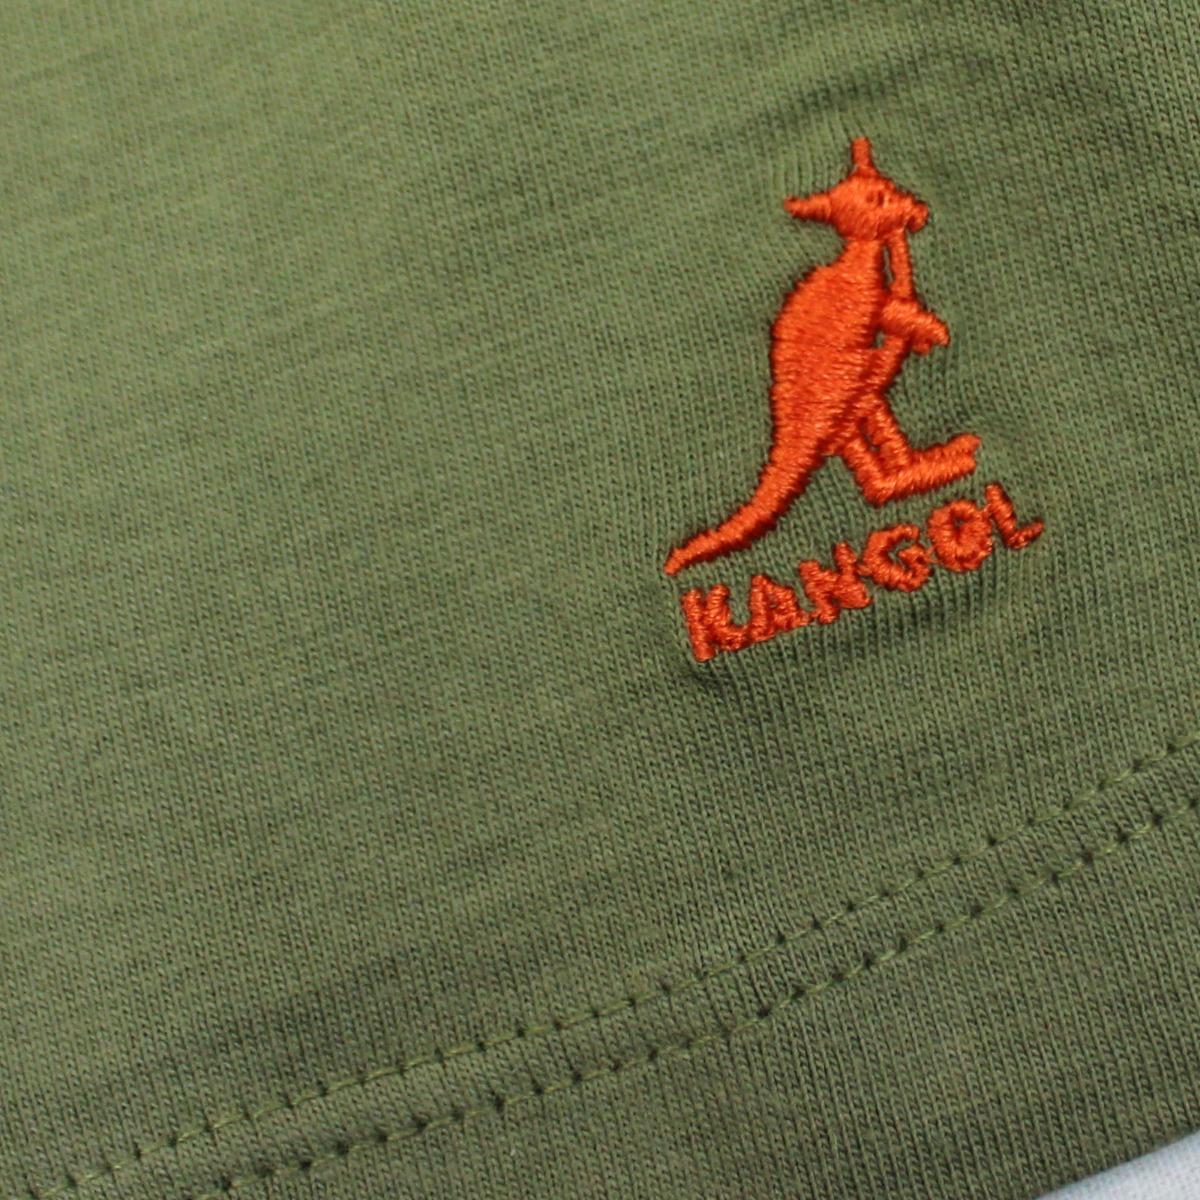 KANGOL Girls T Shirt 2-3 3-4 Years Khaki Green Short Sleeve Top Lightning Strike